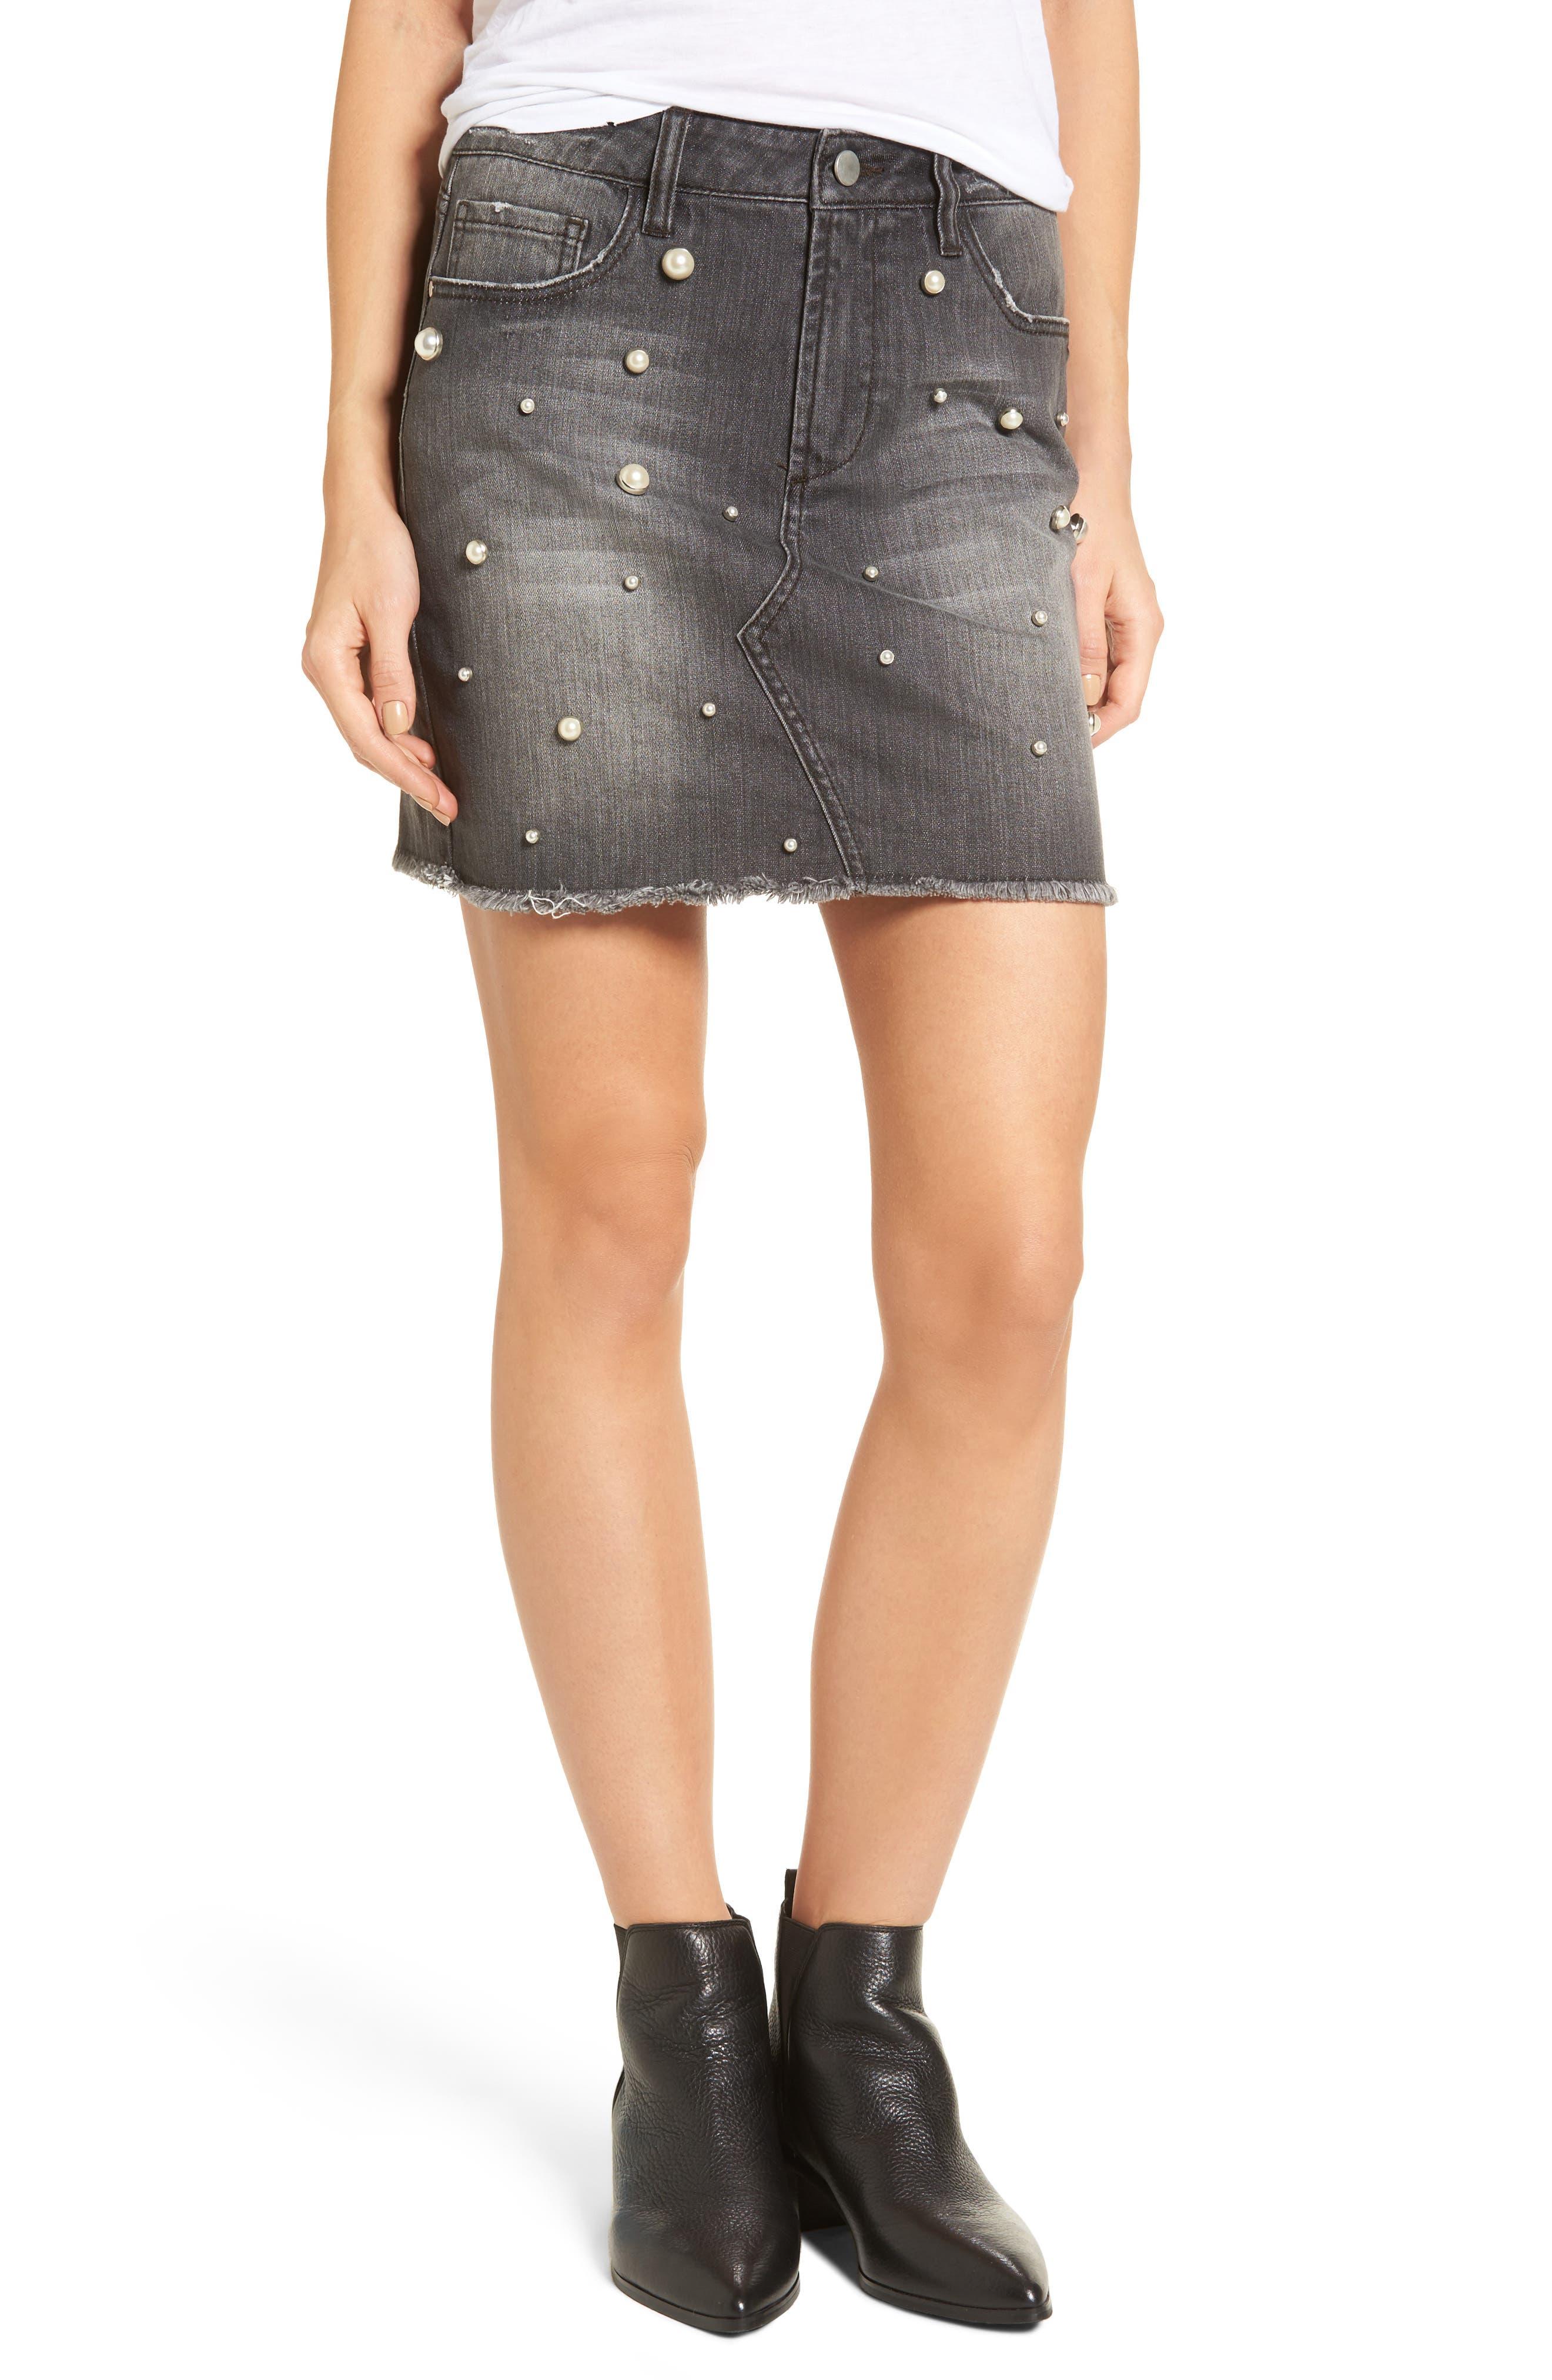 Alternate Image 1 Selected - Tinsel Imitation Pearl Detail Skirt